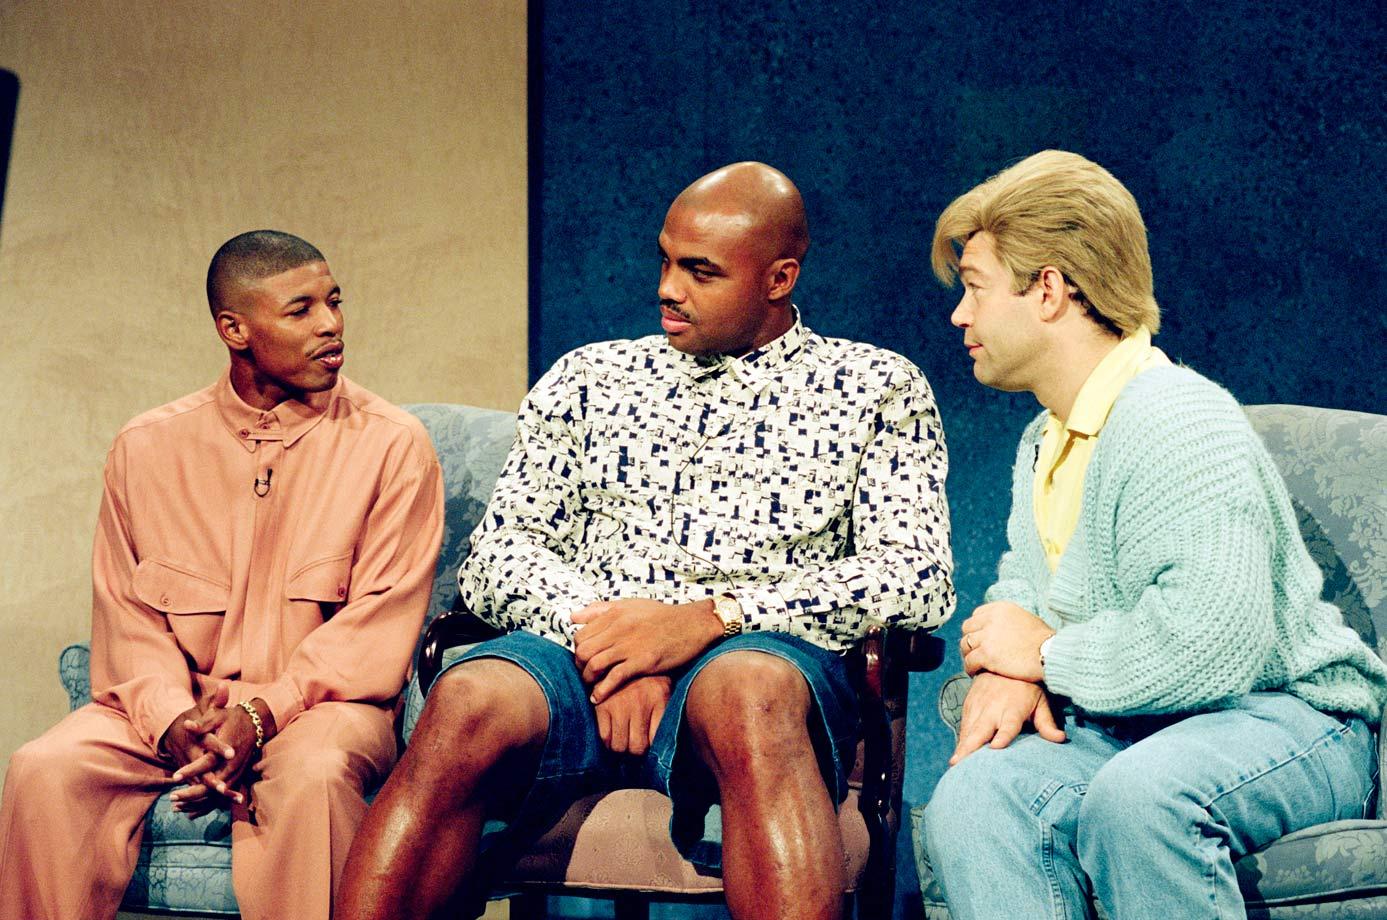 Sept. 25, 1993